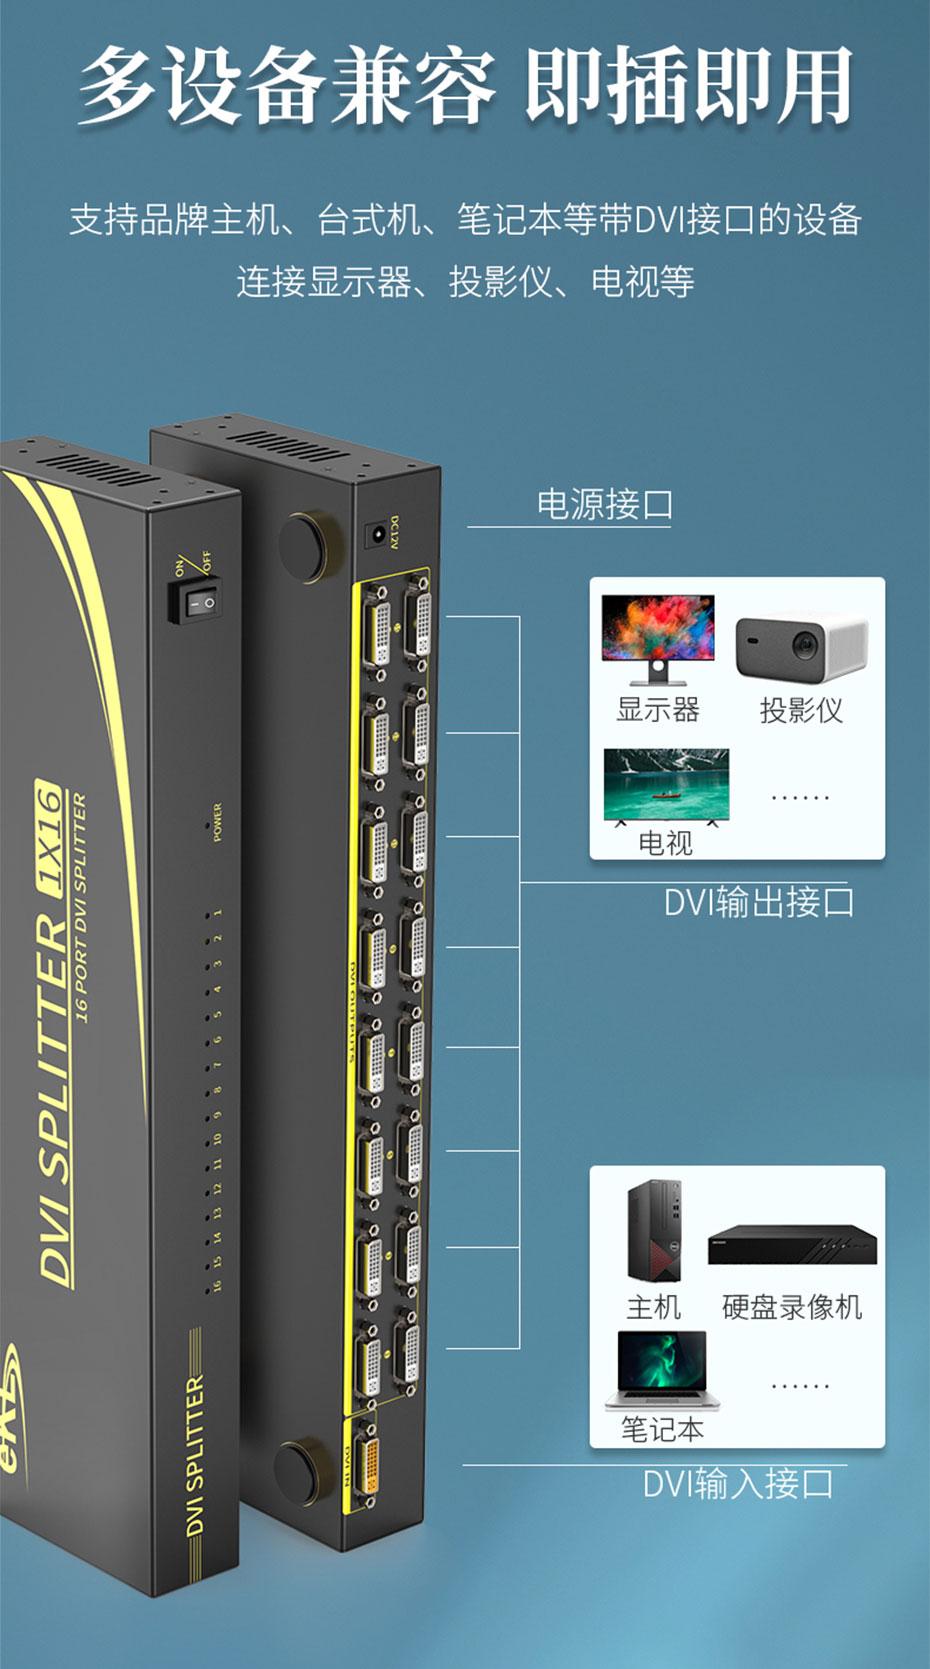 DVI分配器1分16 161D兼容多种DVI接口设备,即插即用